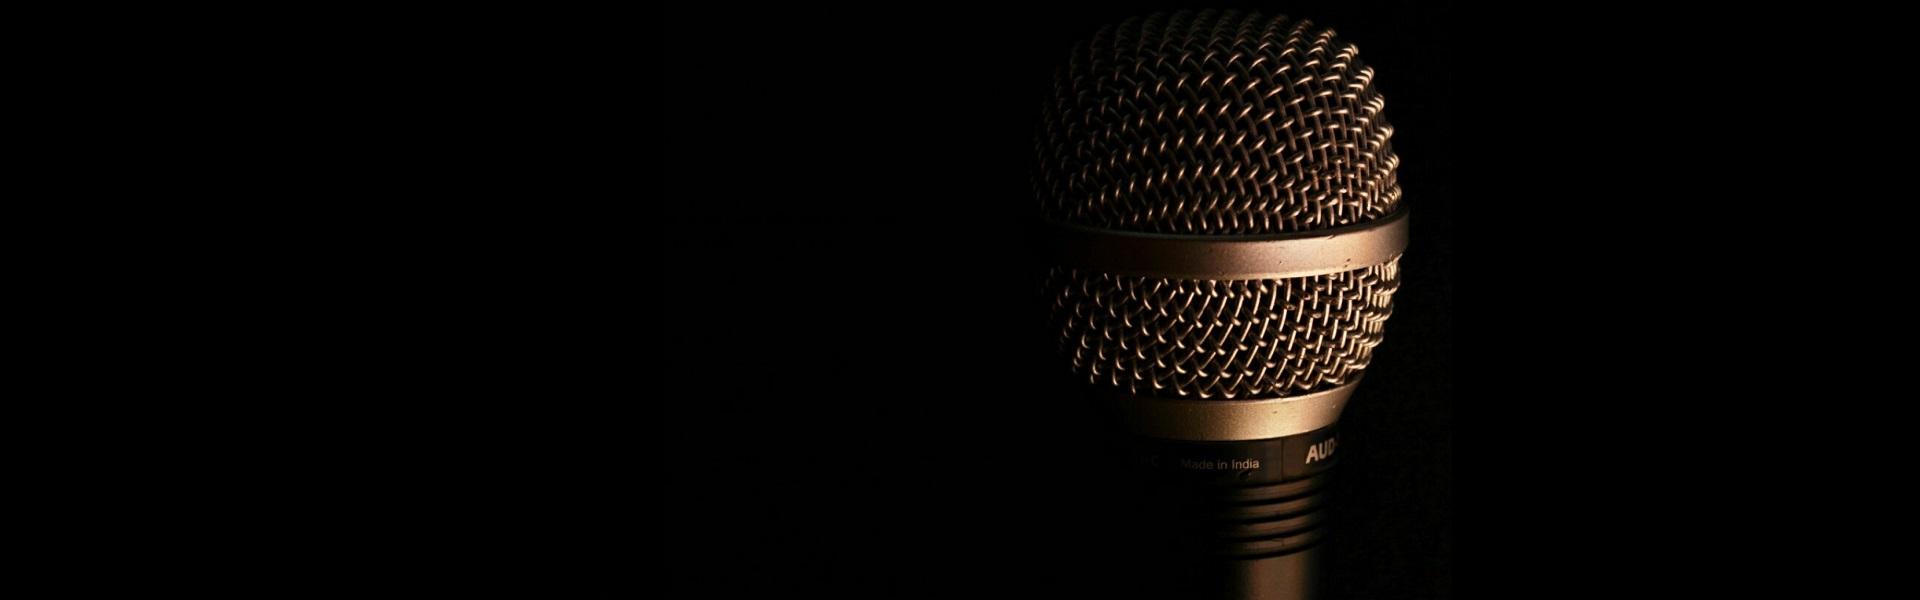 Guld mikrofon mot svart backgrund